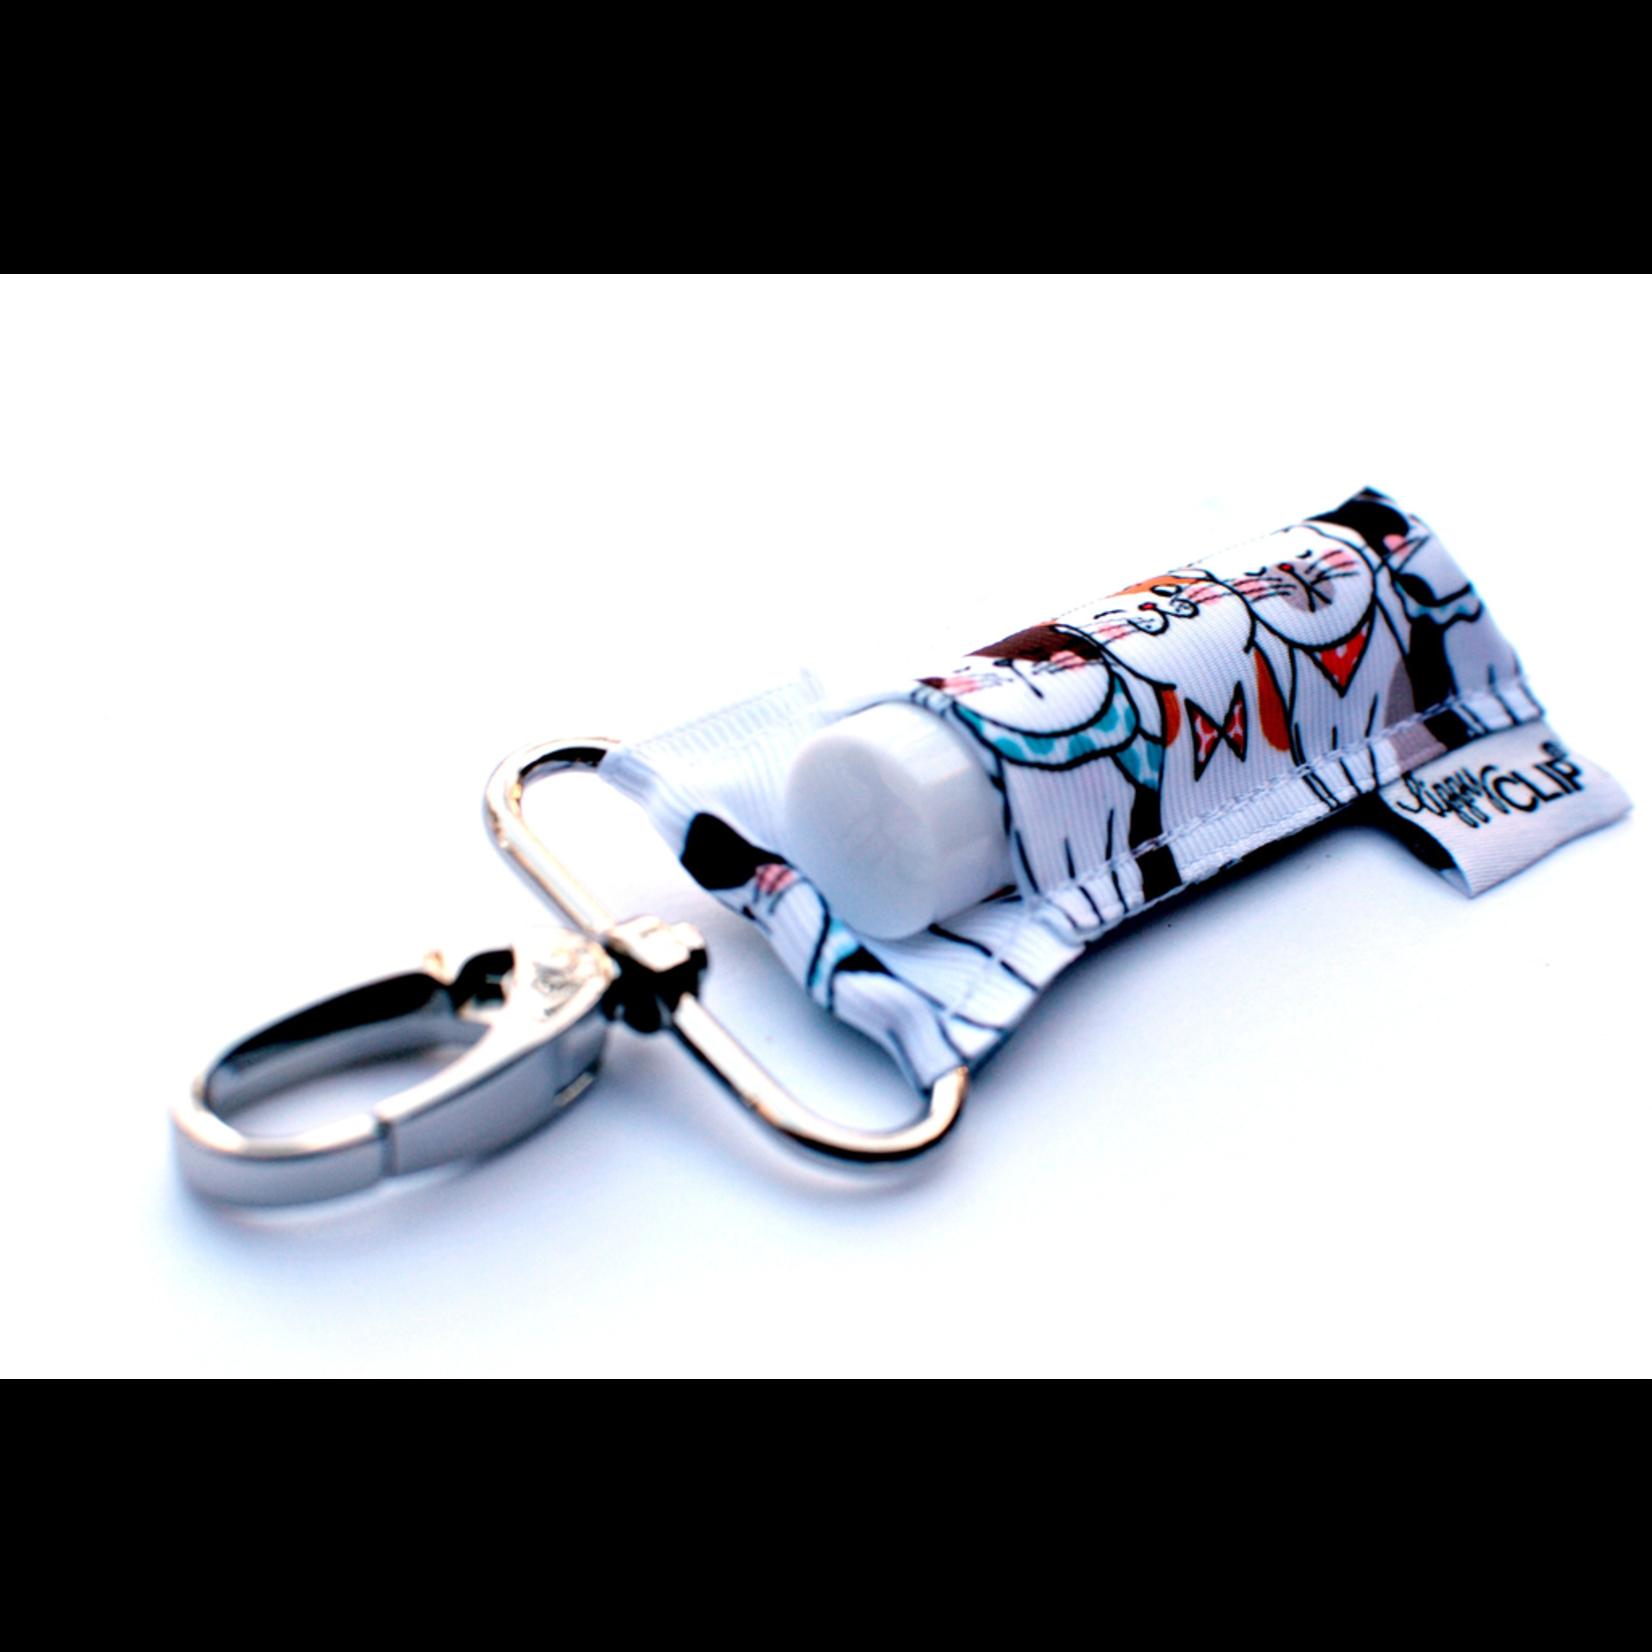 LippyClip Cats lip balm holder